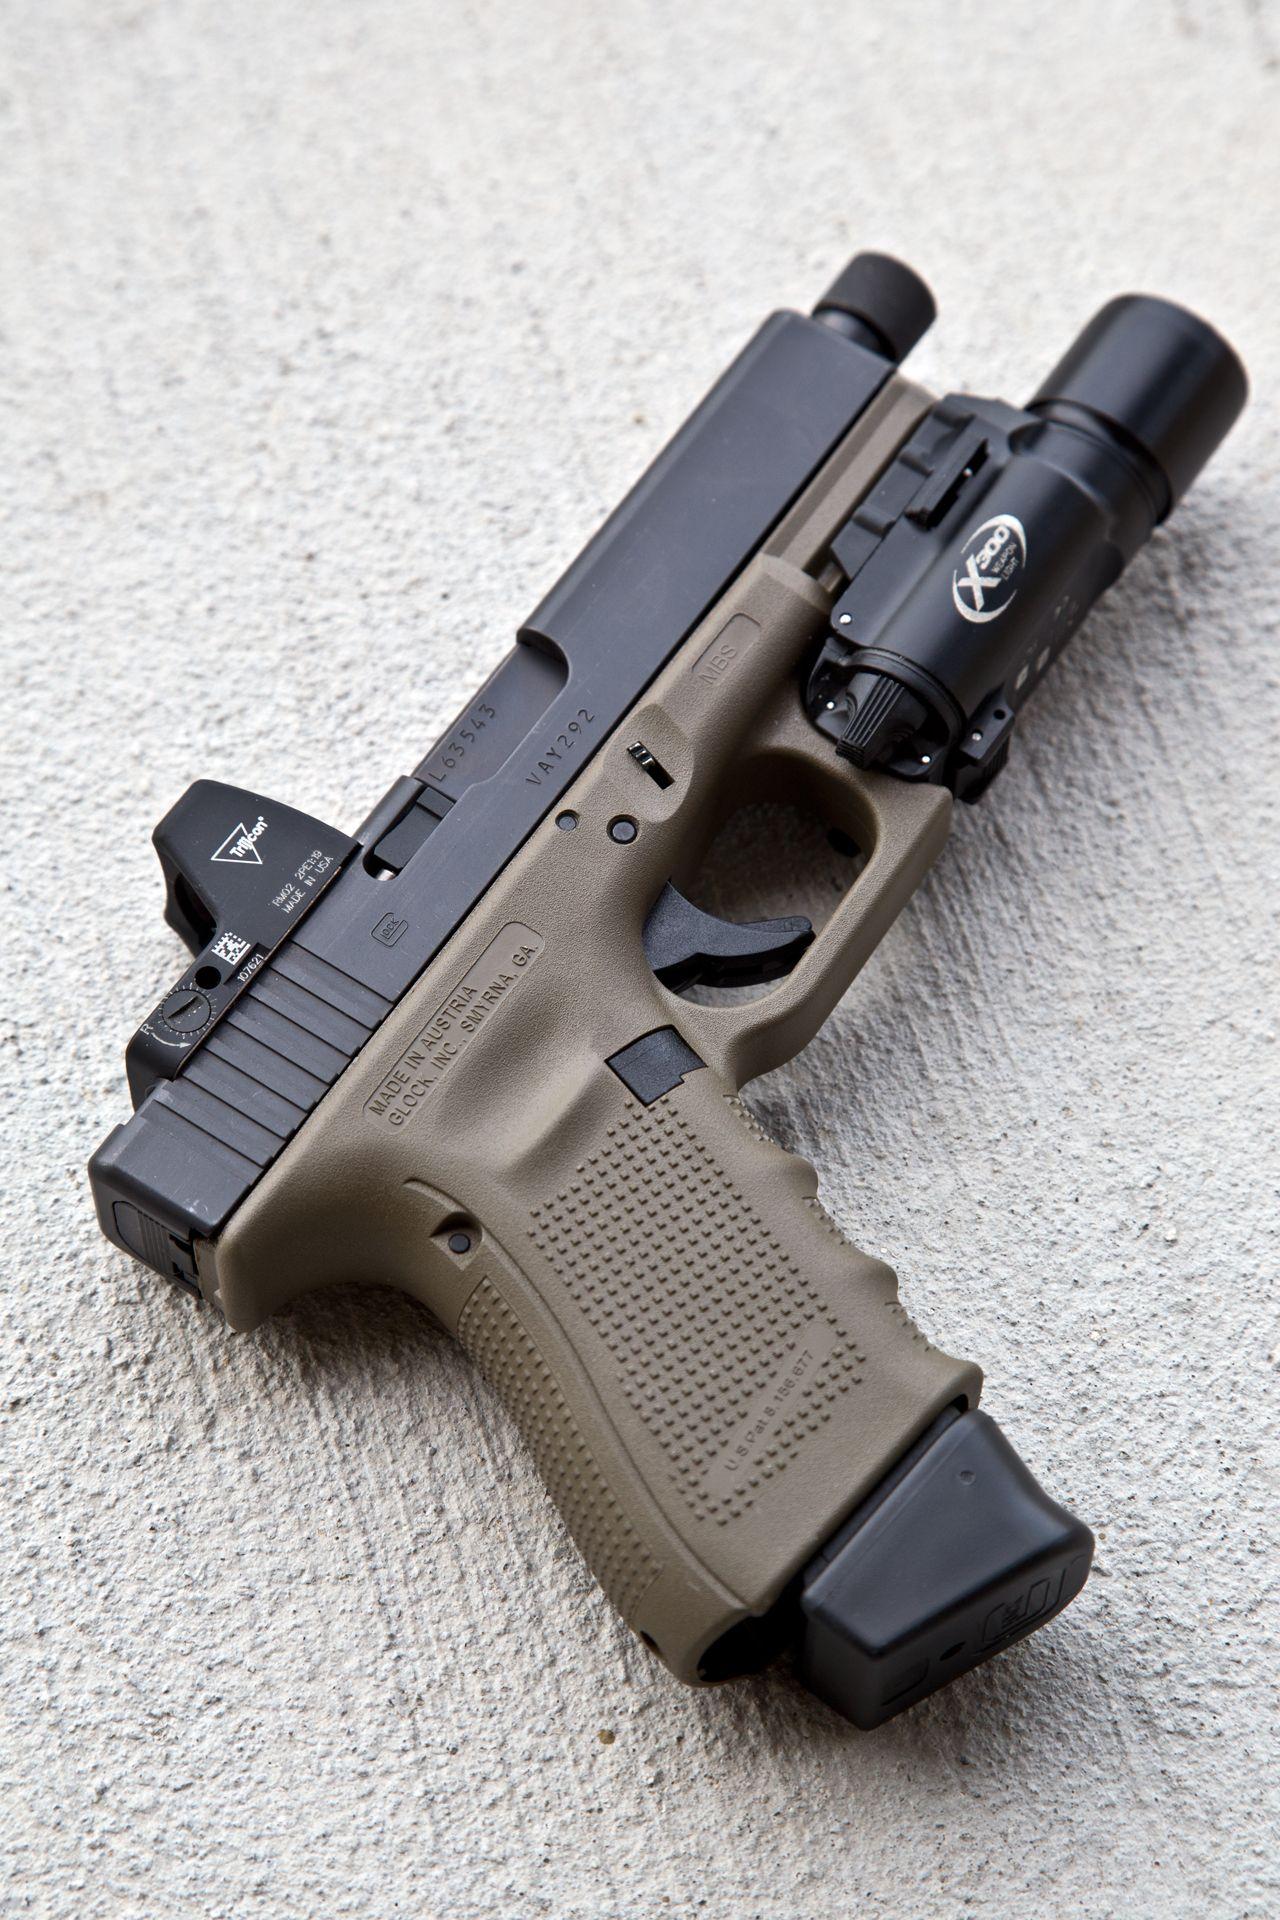 tacticallurk: FDE Glock 19 Gen 4 + Trijicon RMR + Surefire